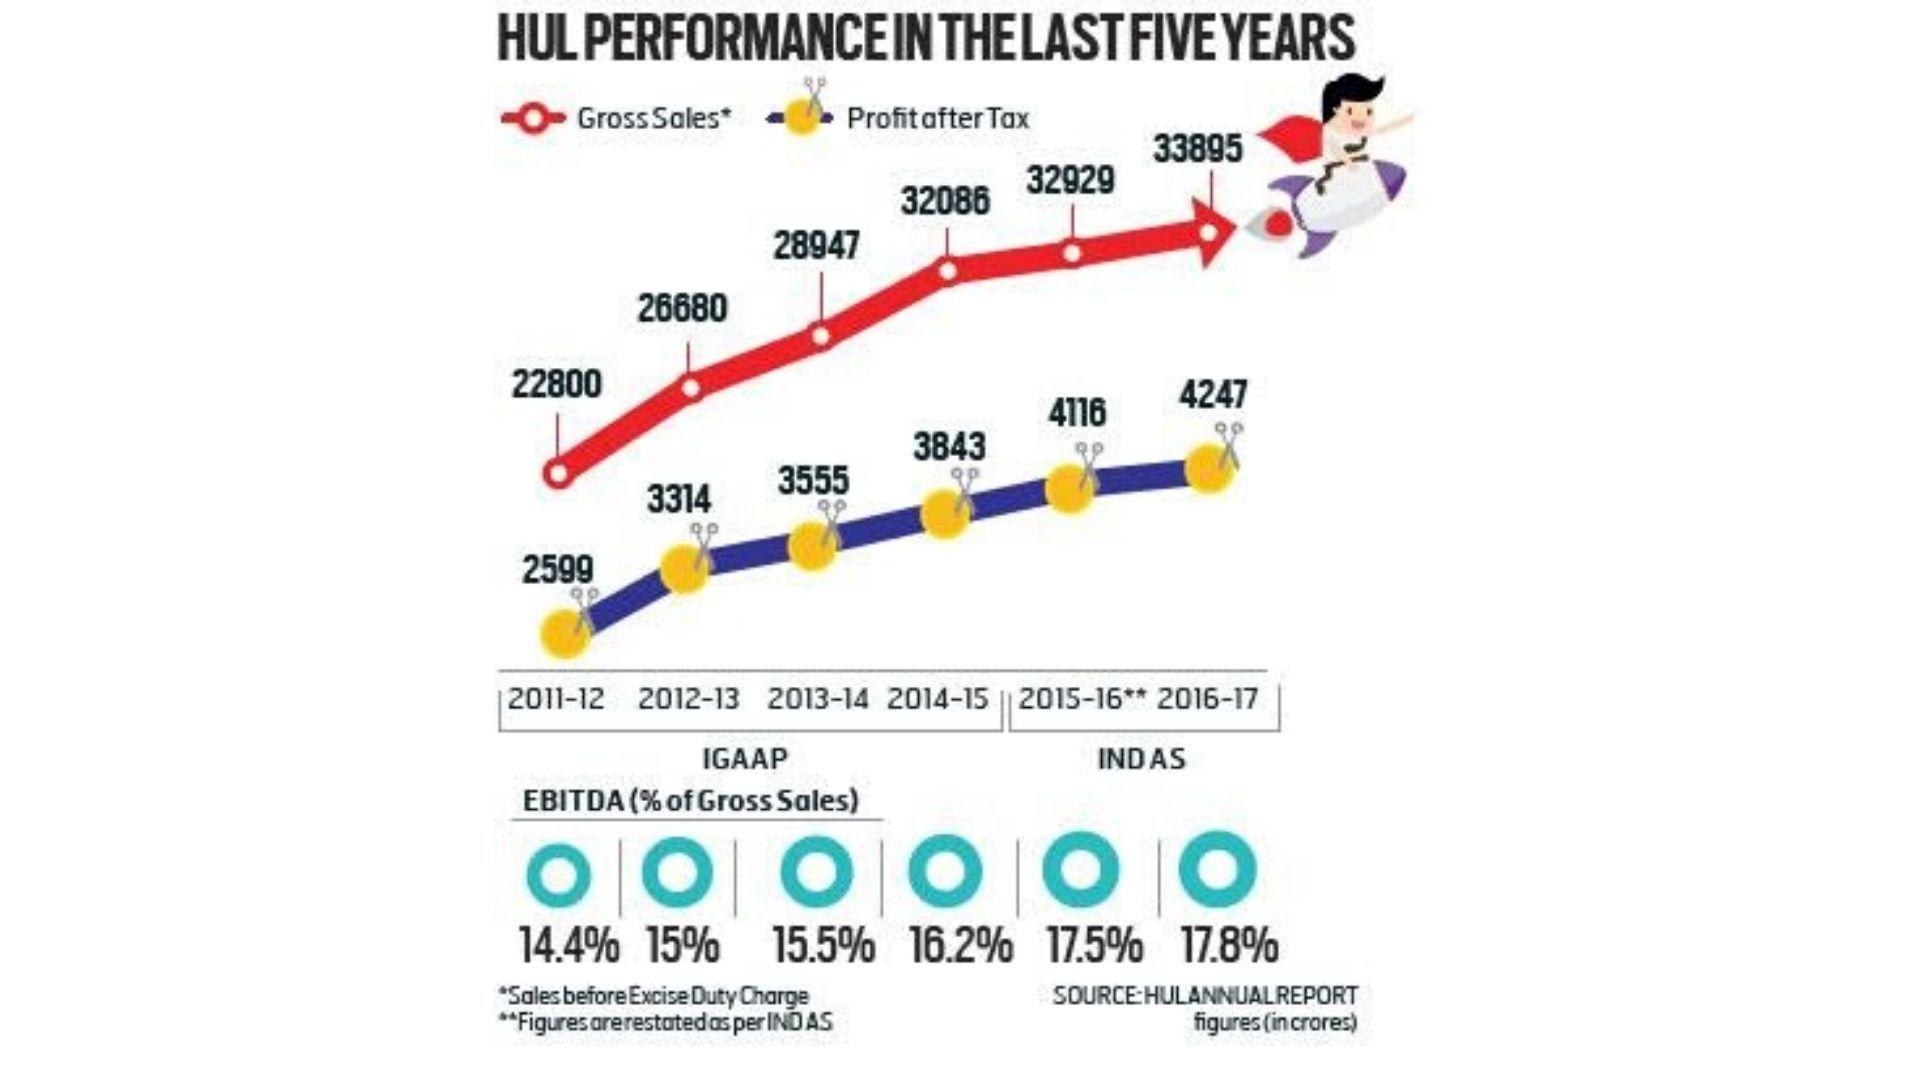 Hindustan Unilever's Performance In Past Years